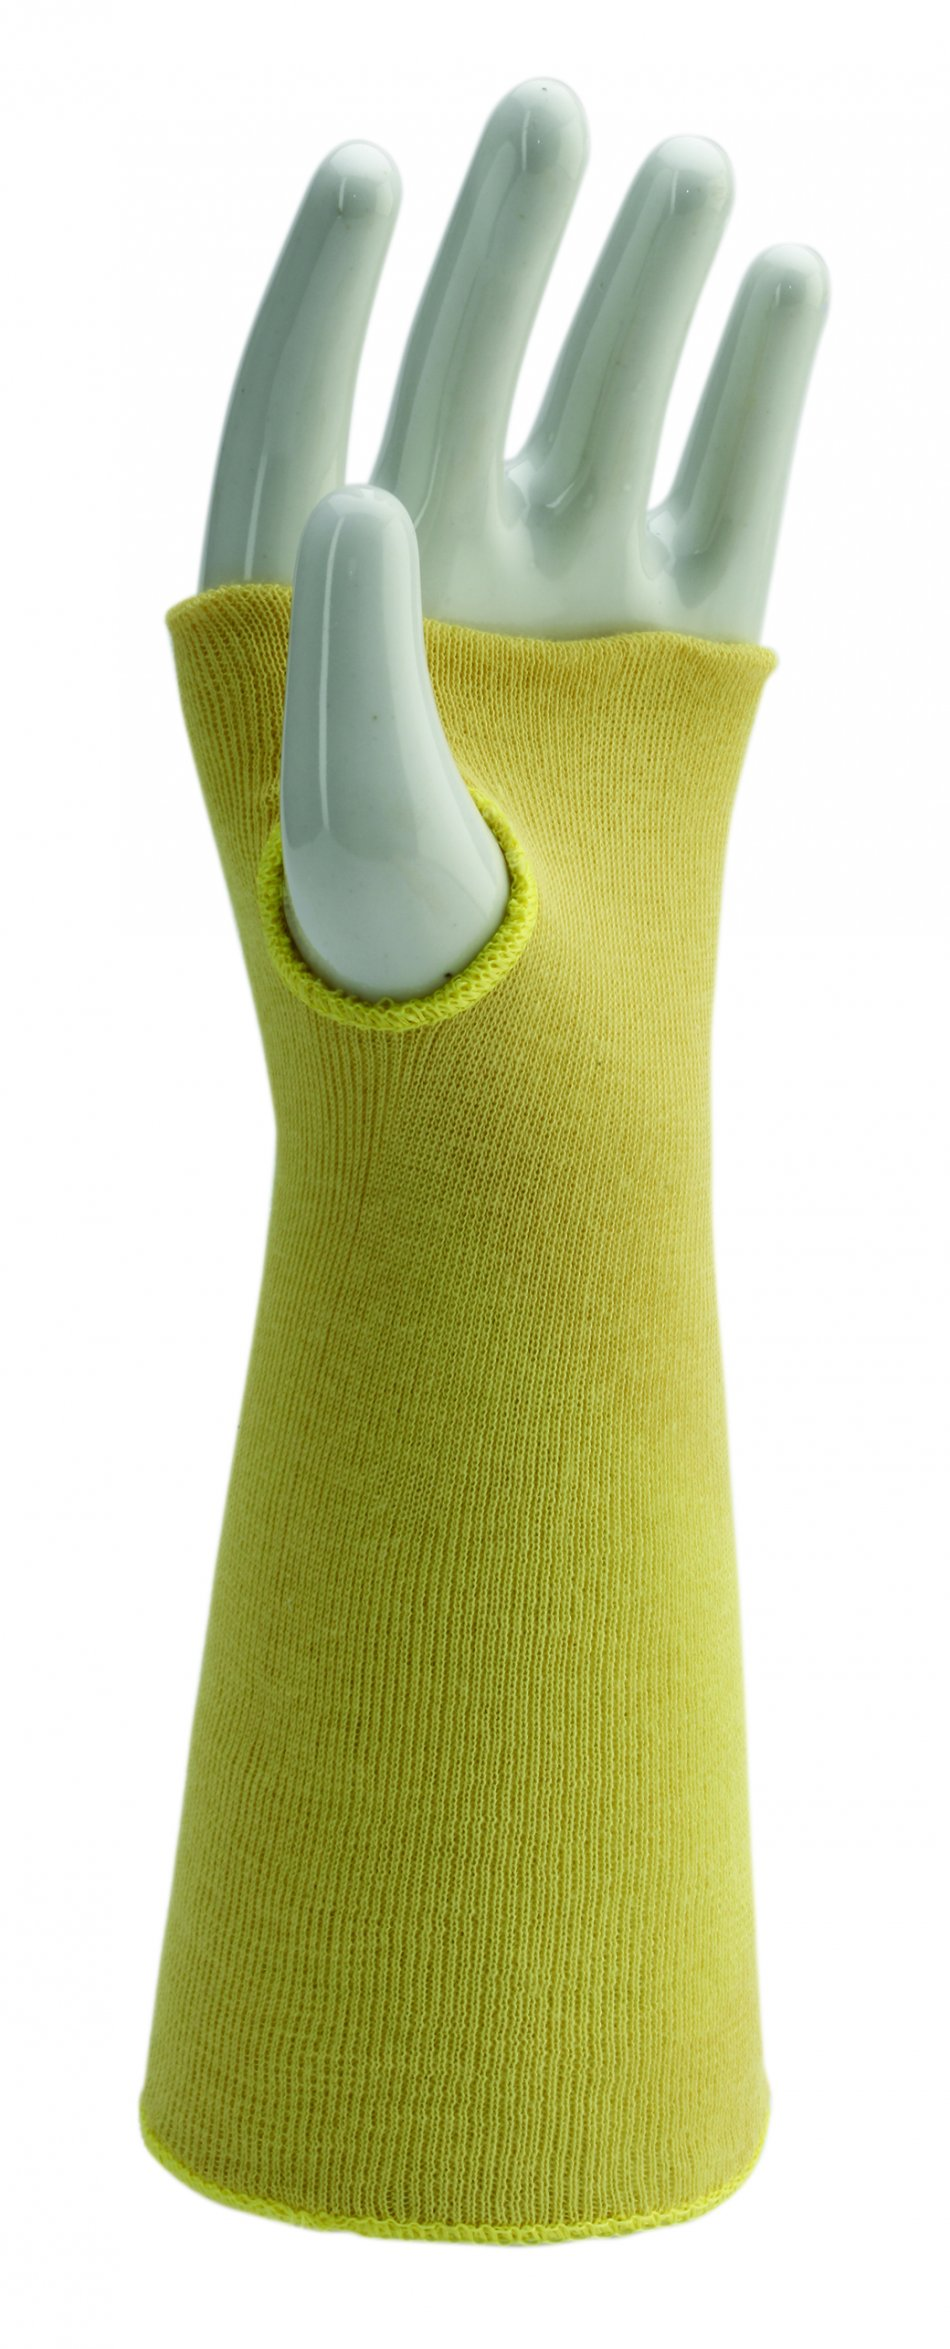 Protector kevlar pentru antebraţ,40 cm